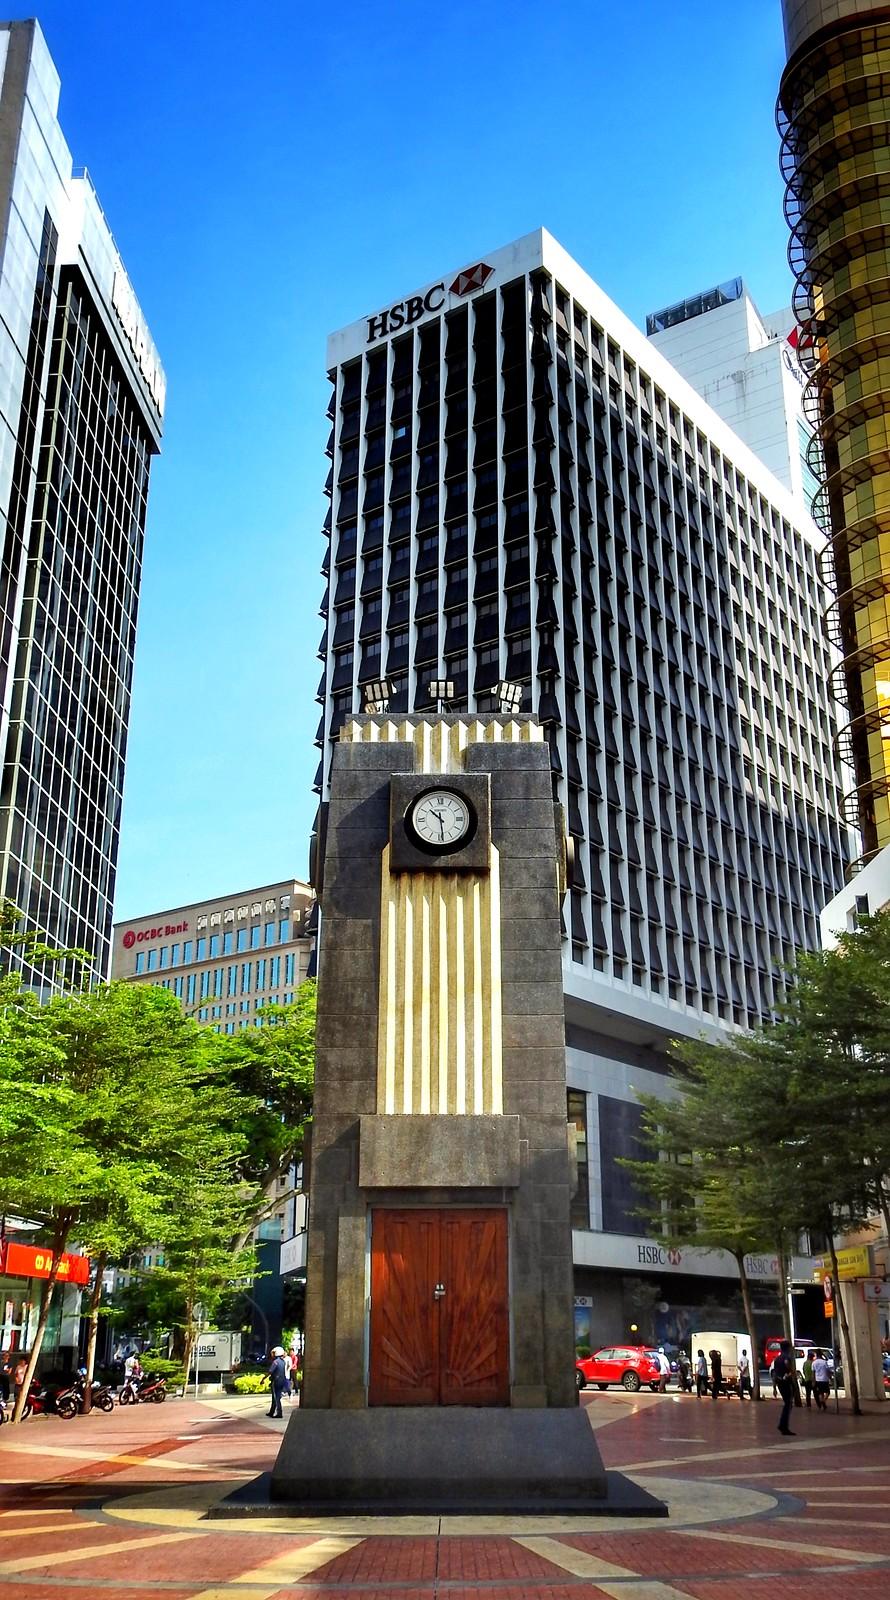 Medan Pasar Clock Tower